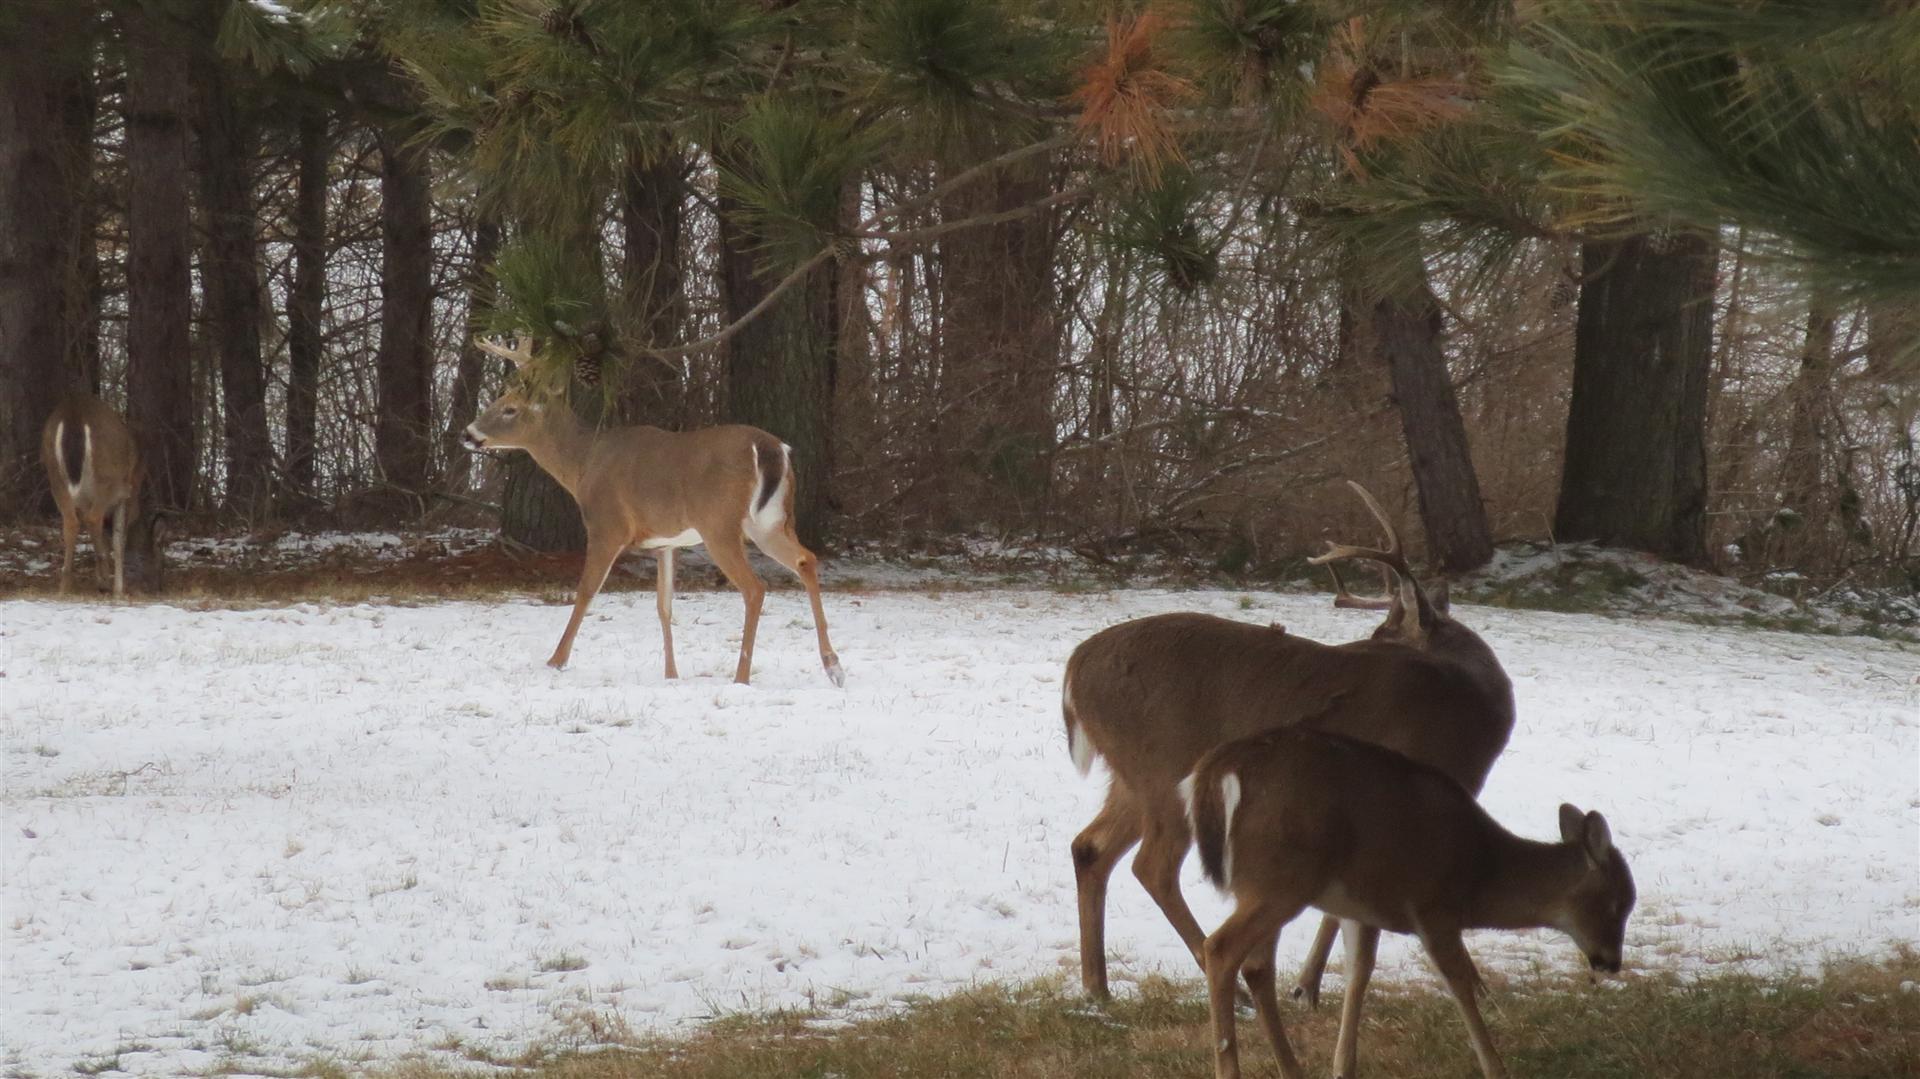 Bucks-45